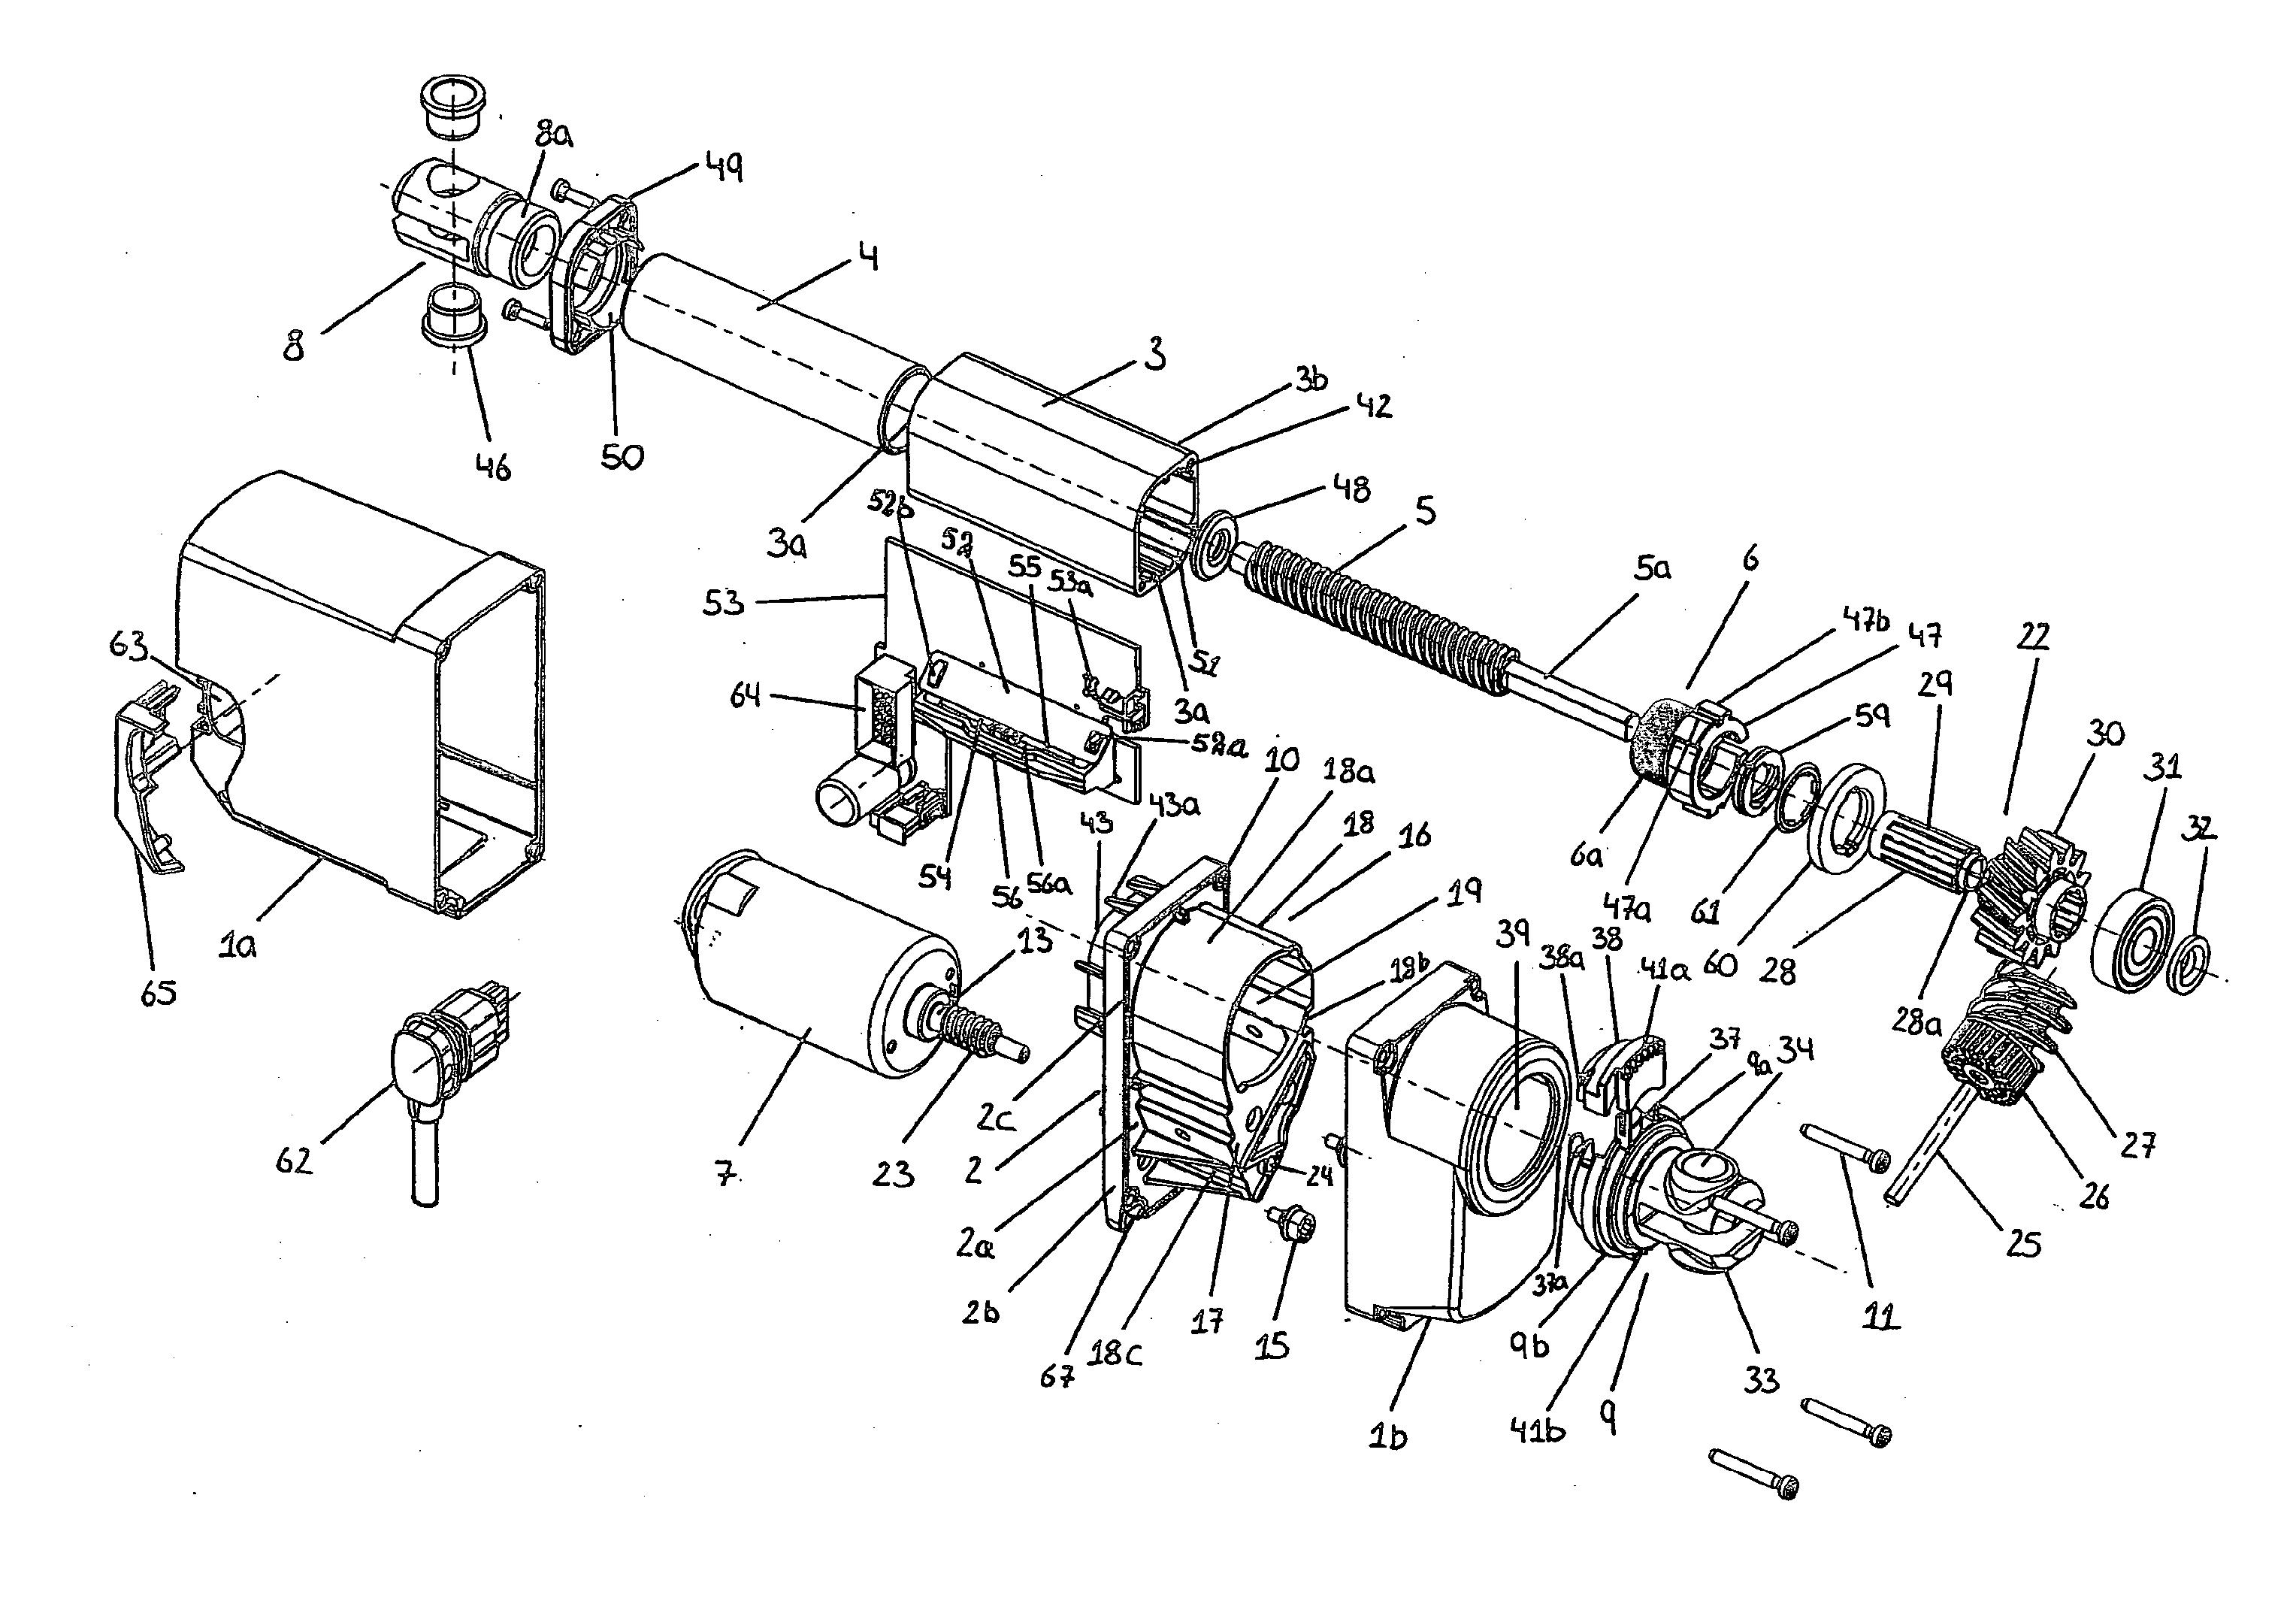 patent us20120222509 - linear actuator